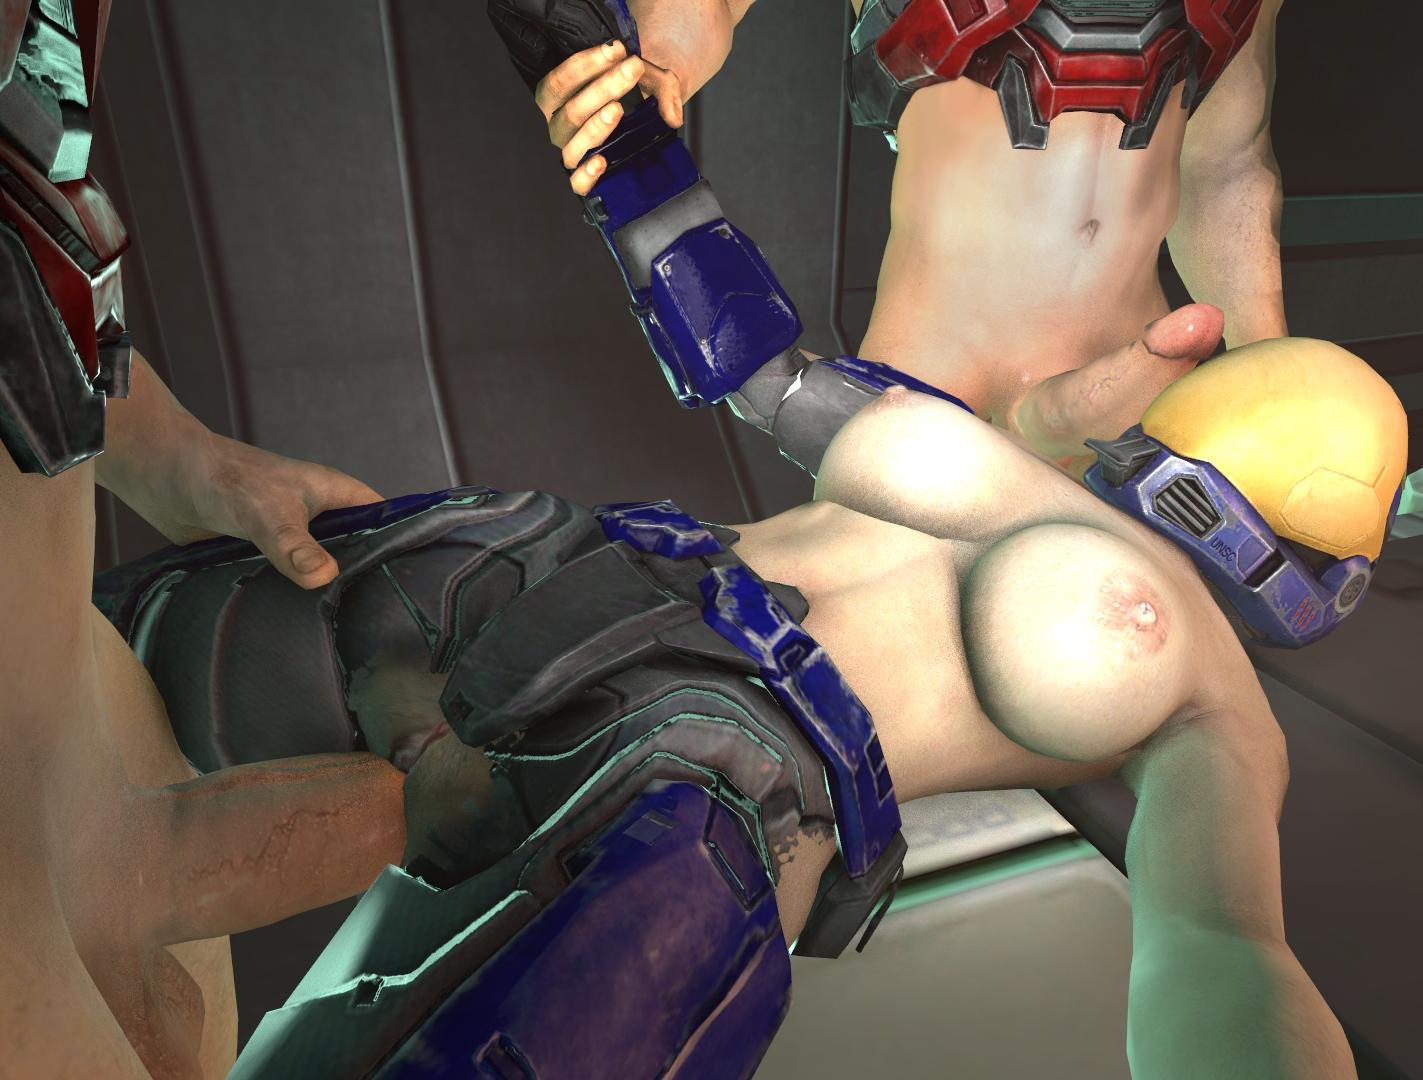 Halo Reach Porn Halo Porn Estartit Webcam